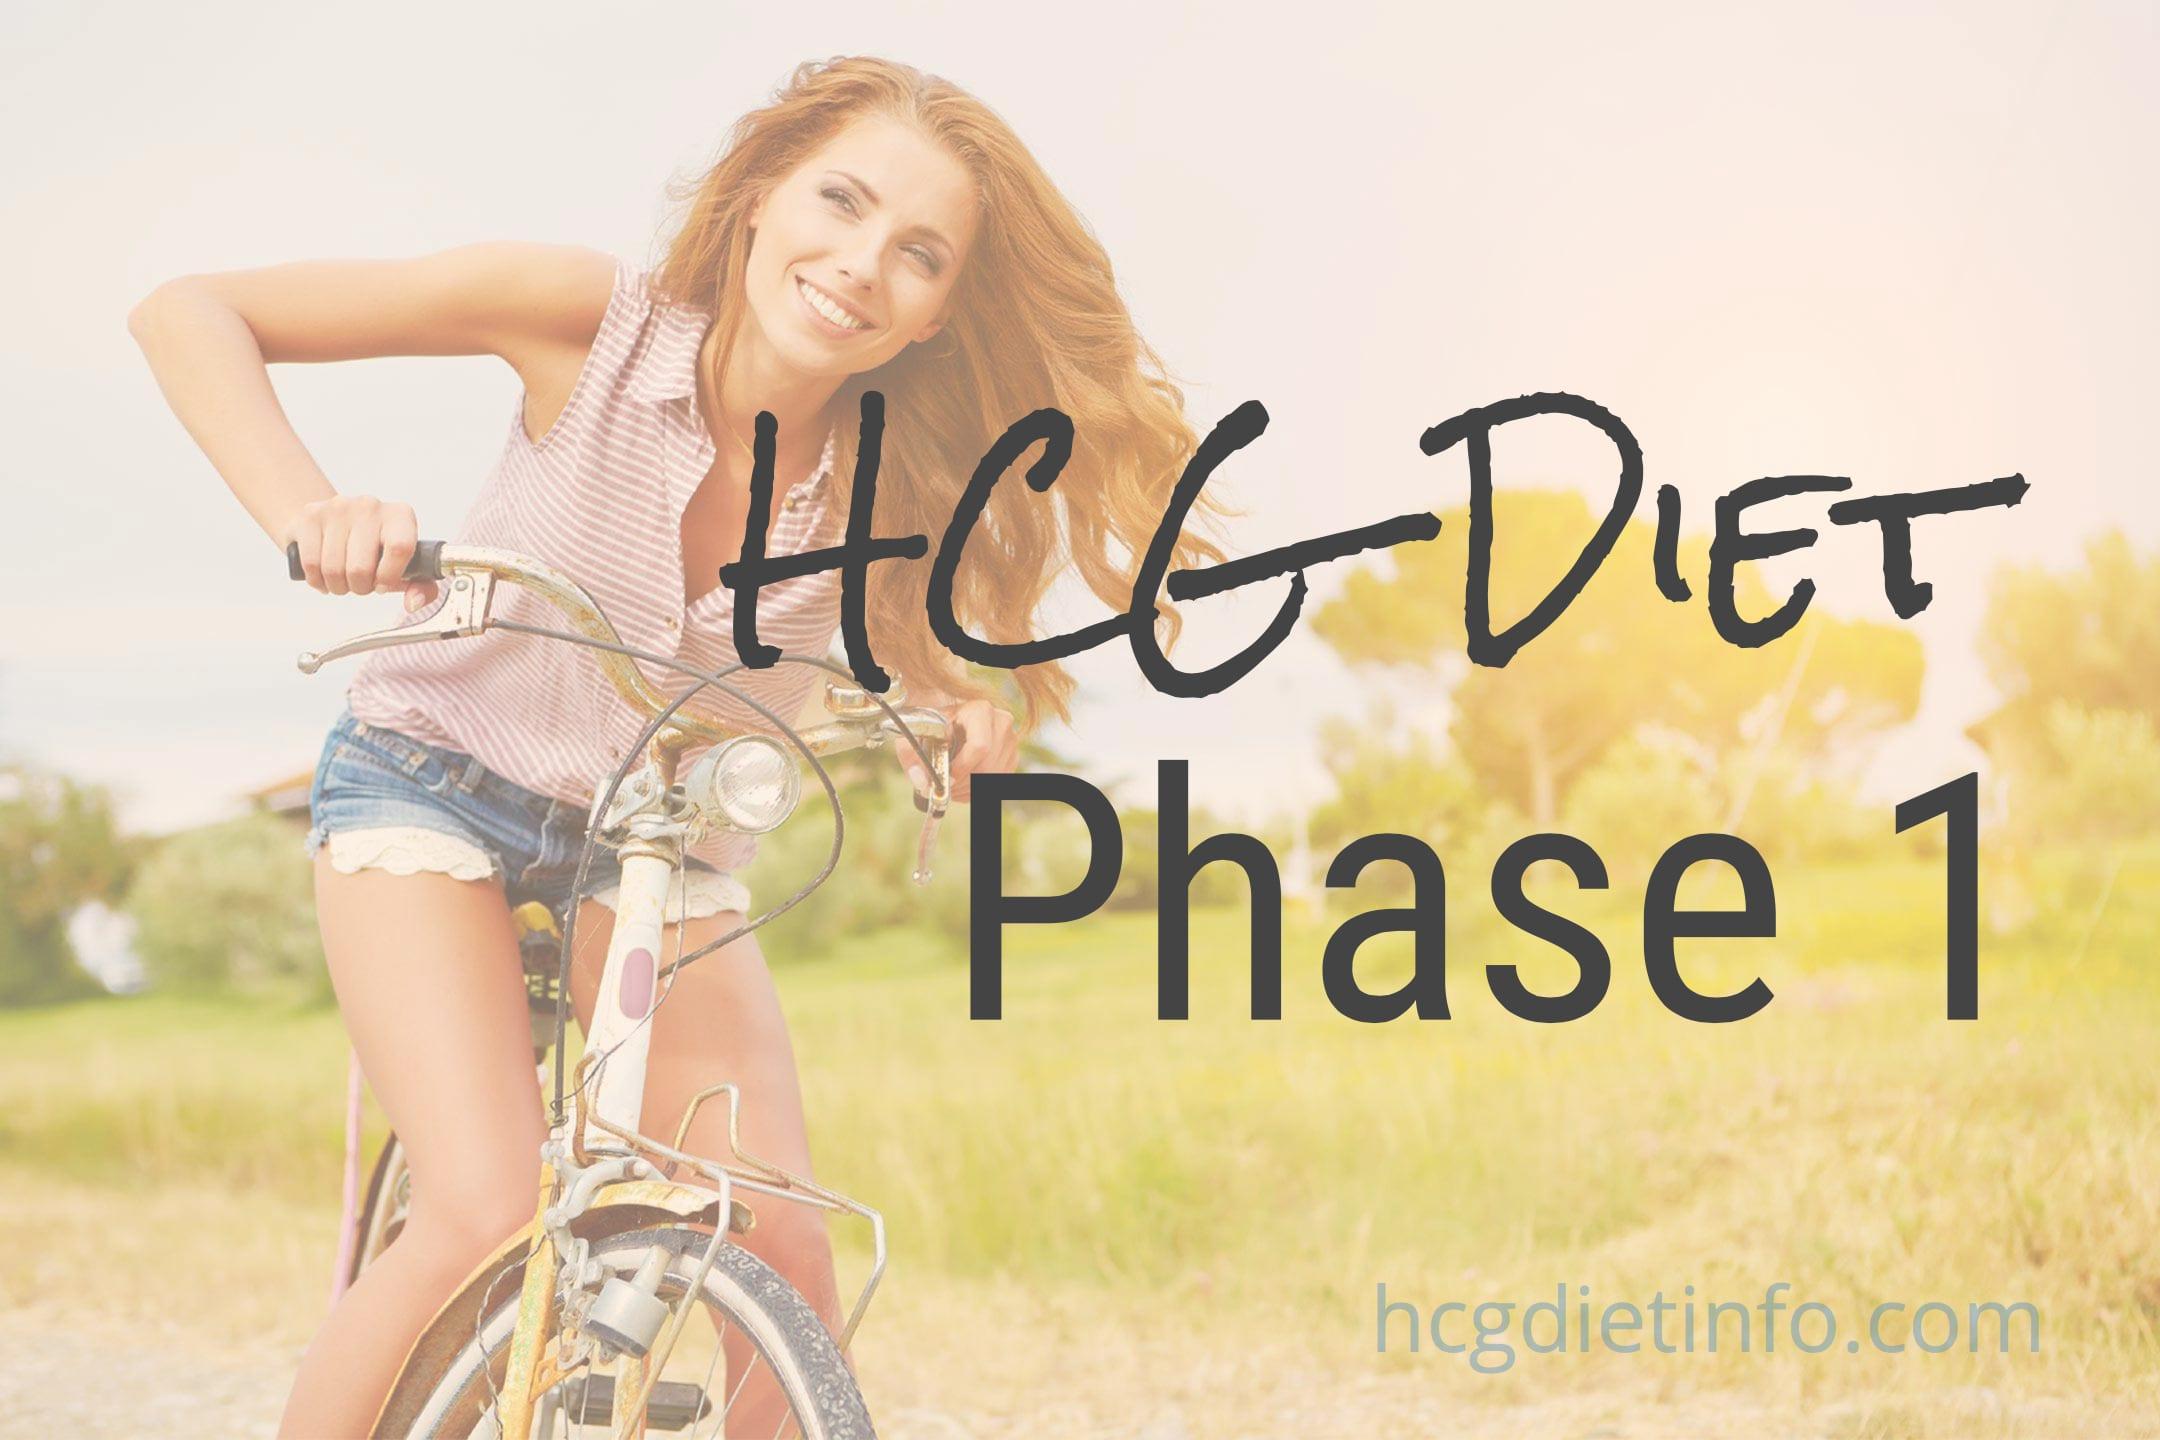 Hcg Diet Phase 1: The Loading Phase